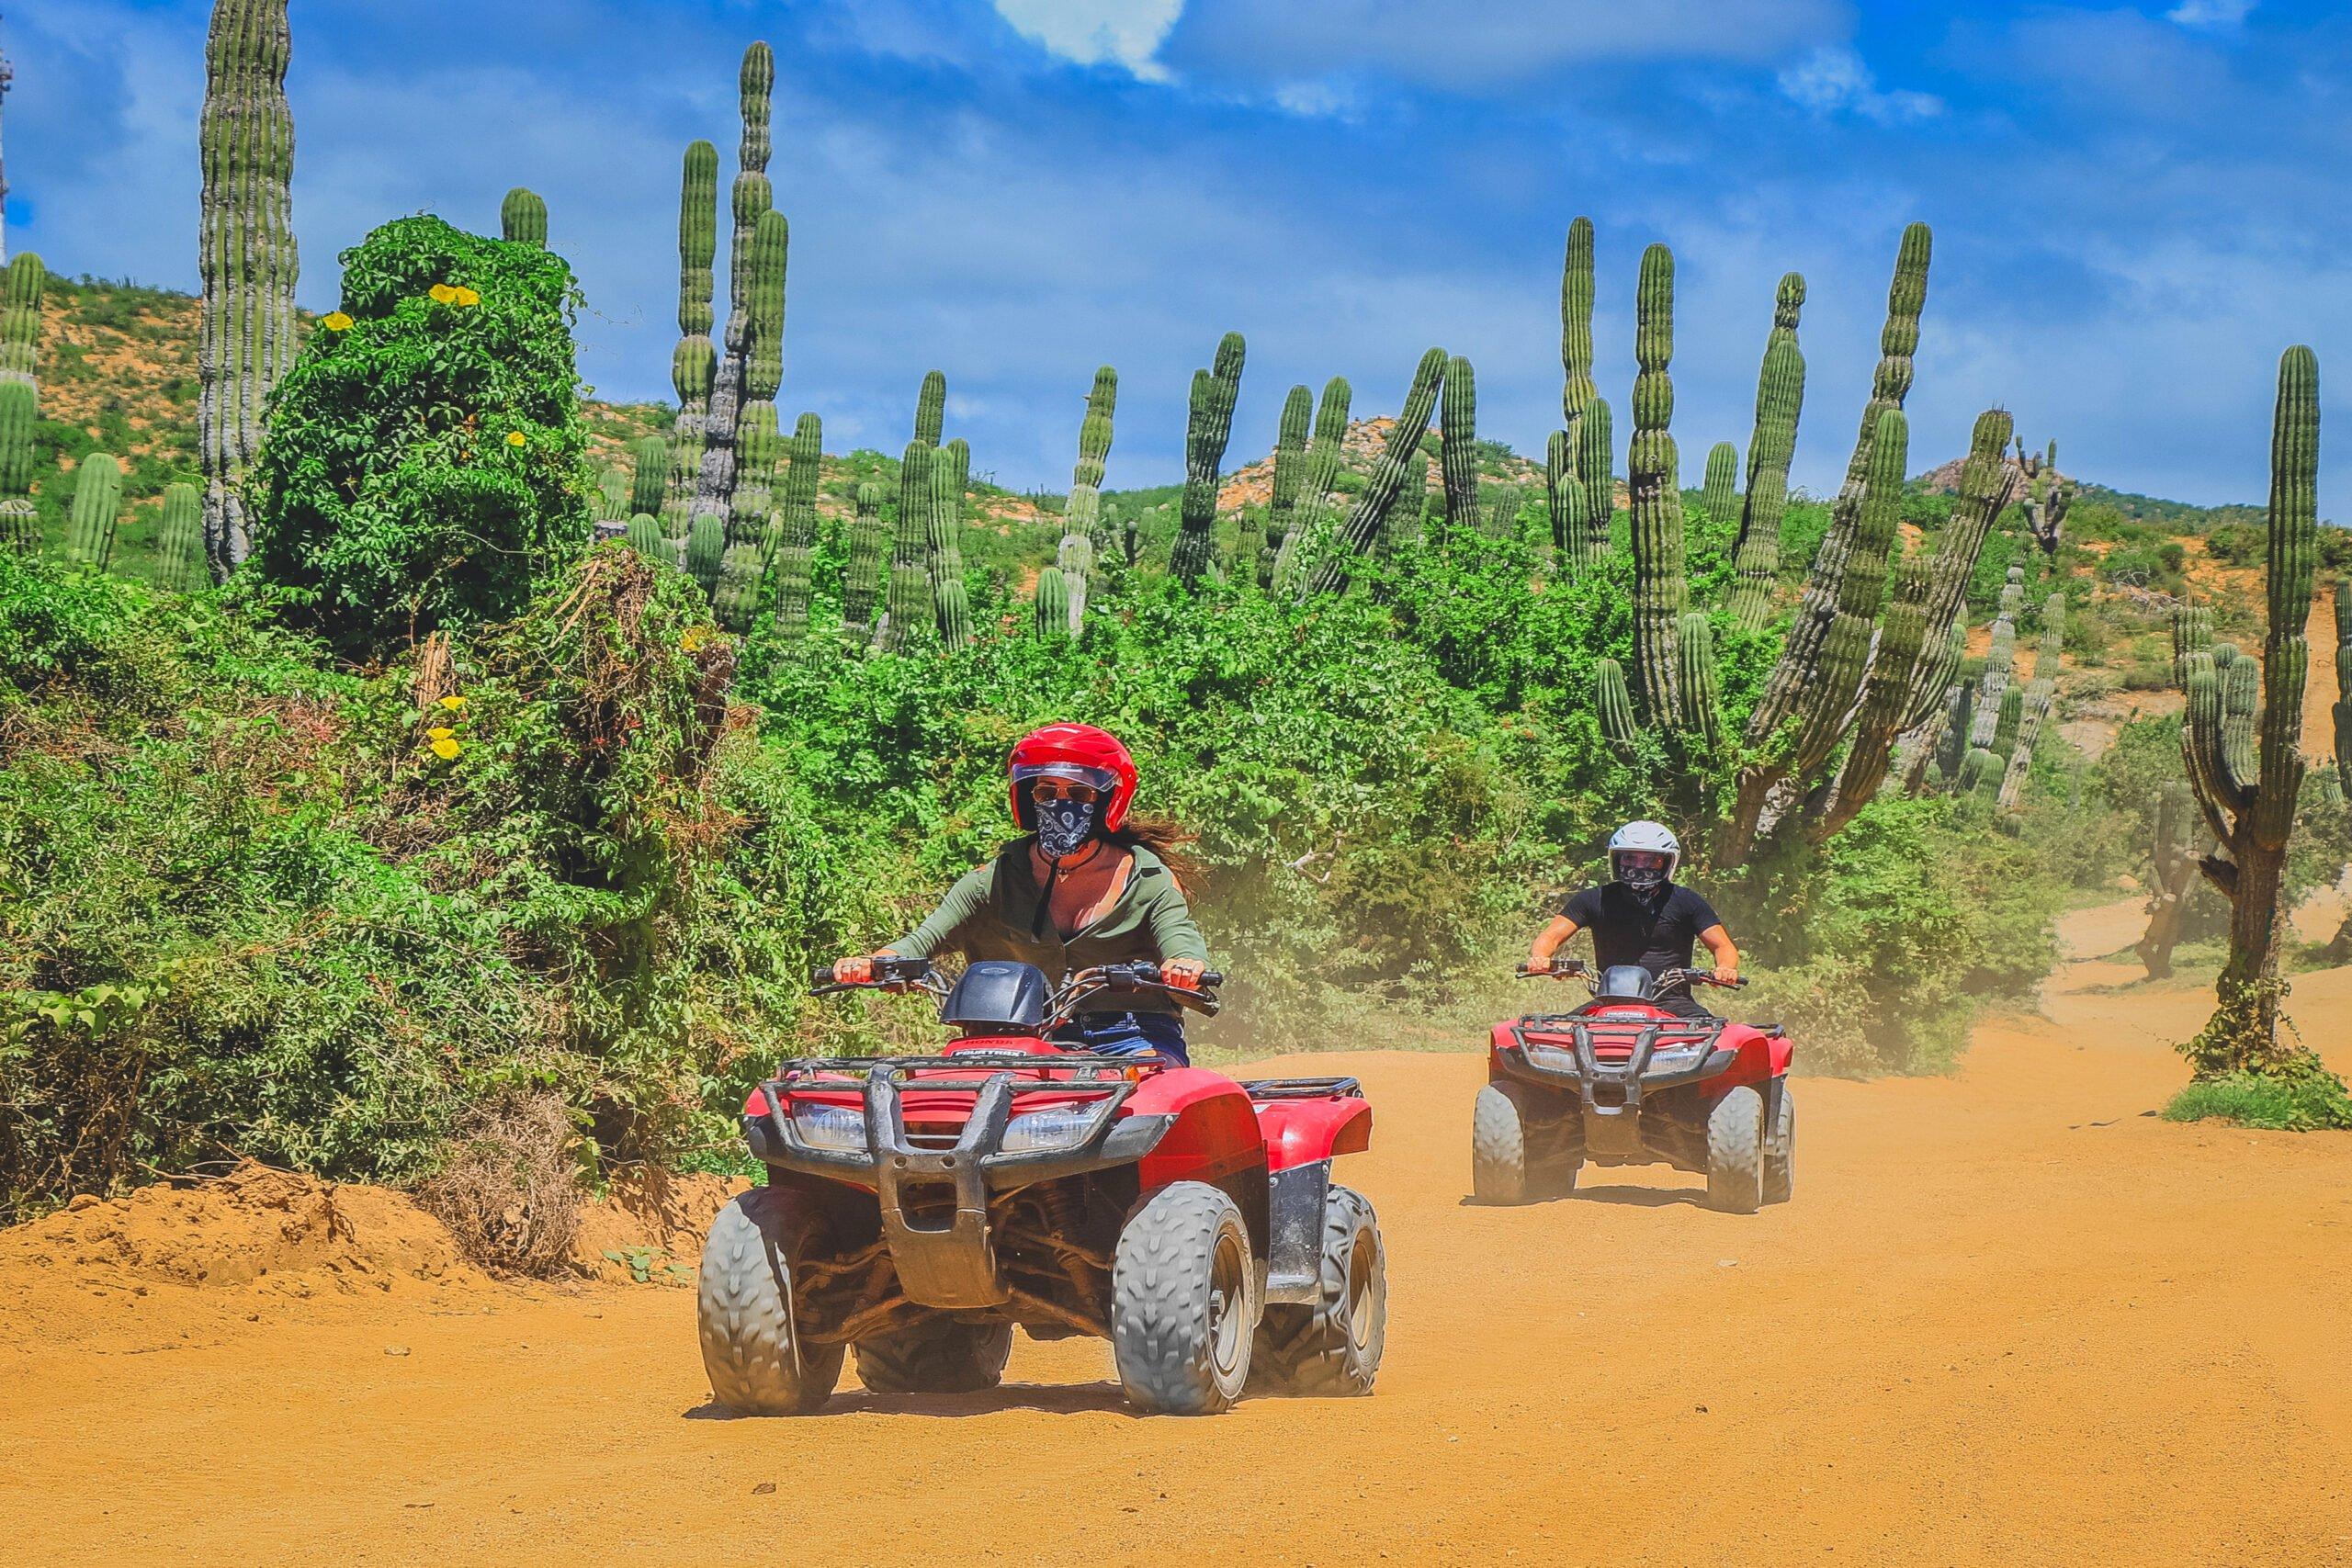 Migrino Atv Tour From Los Cabos_54 (2)